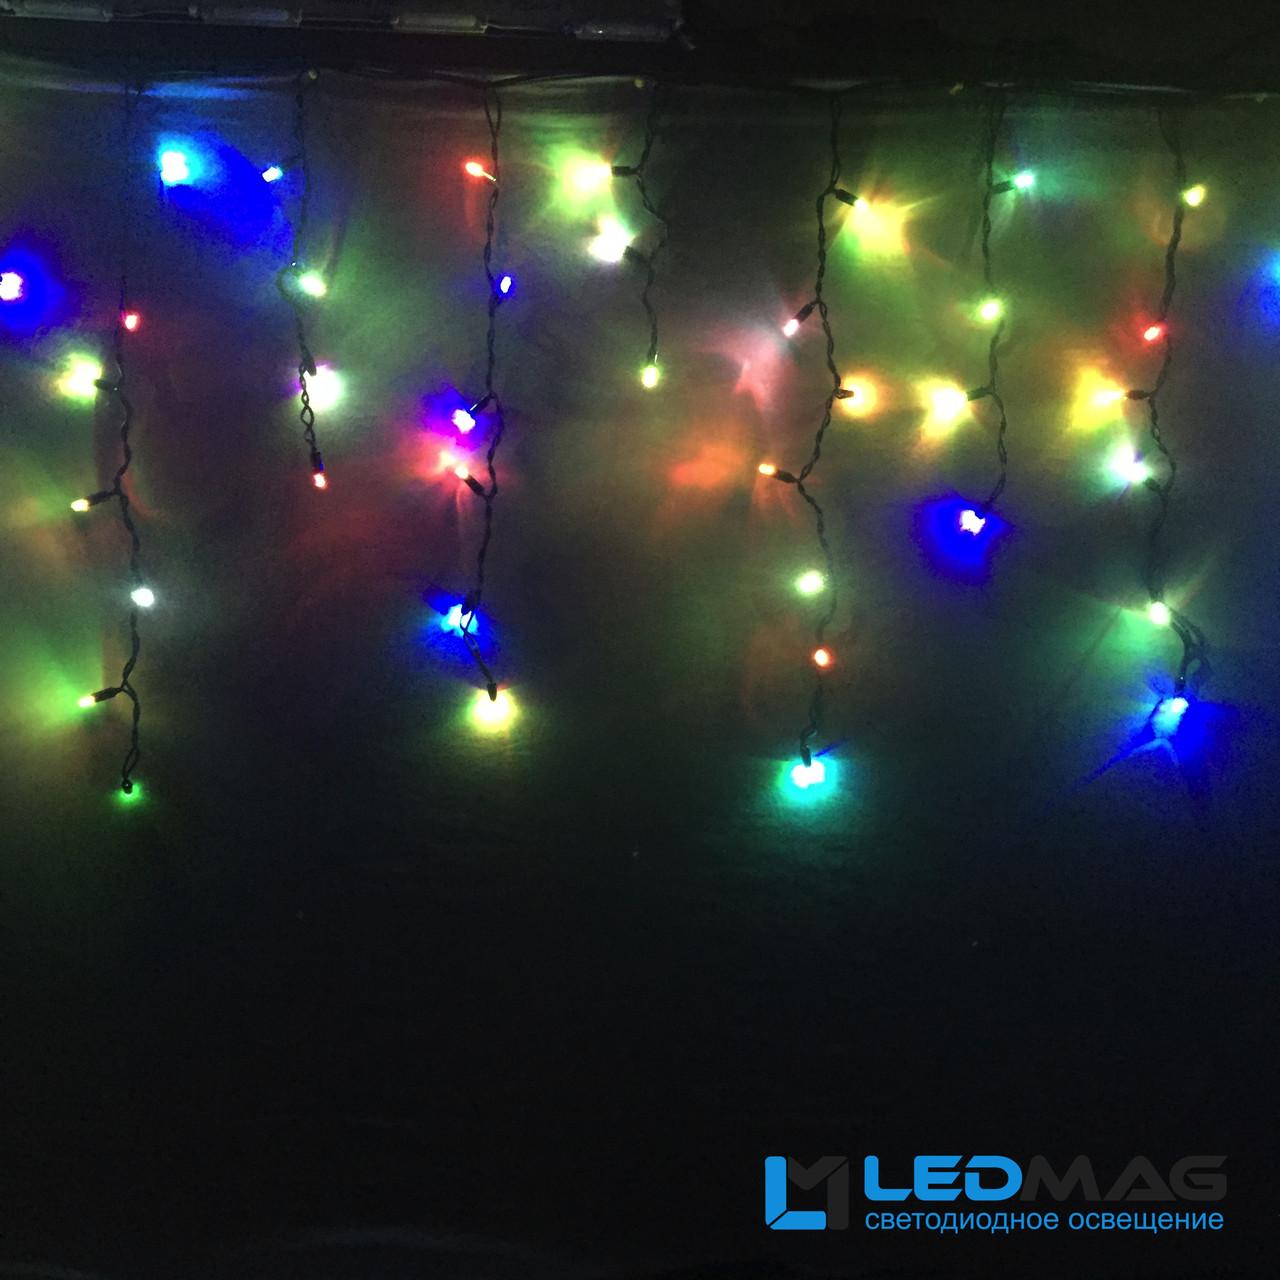 Светодиодная гирлянда уличная Бахрома Flash 3х0.7 м 100LED Каучук RGB